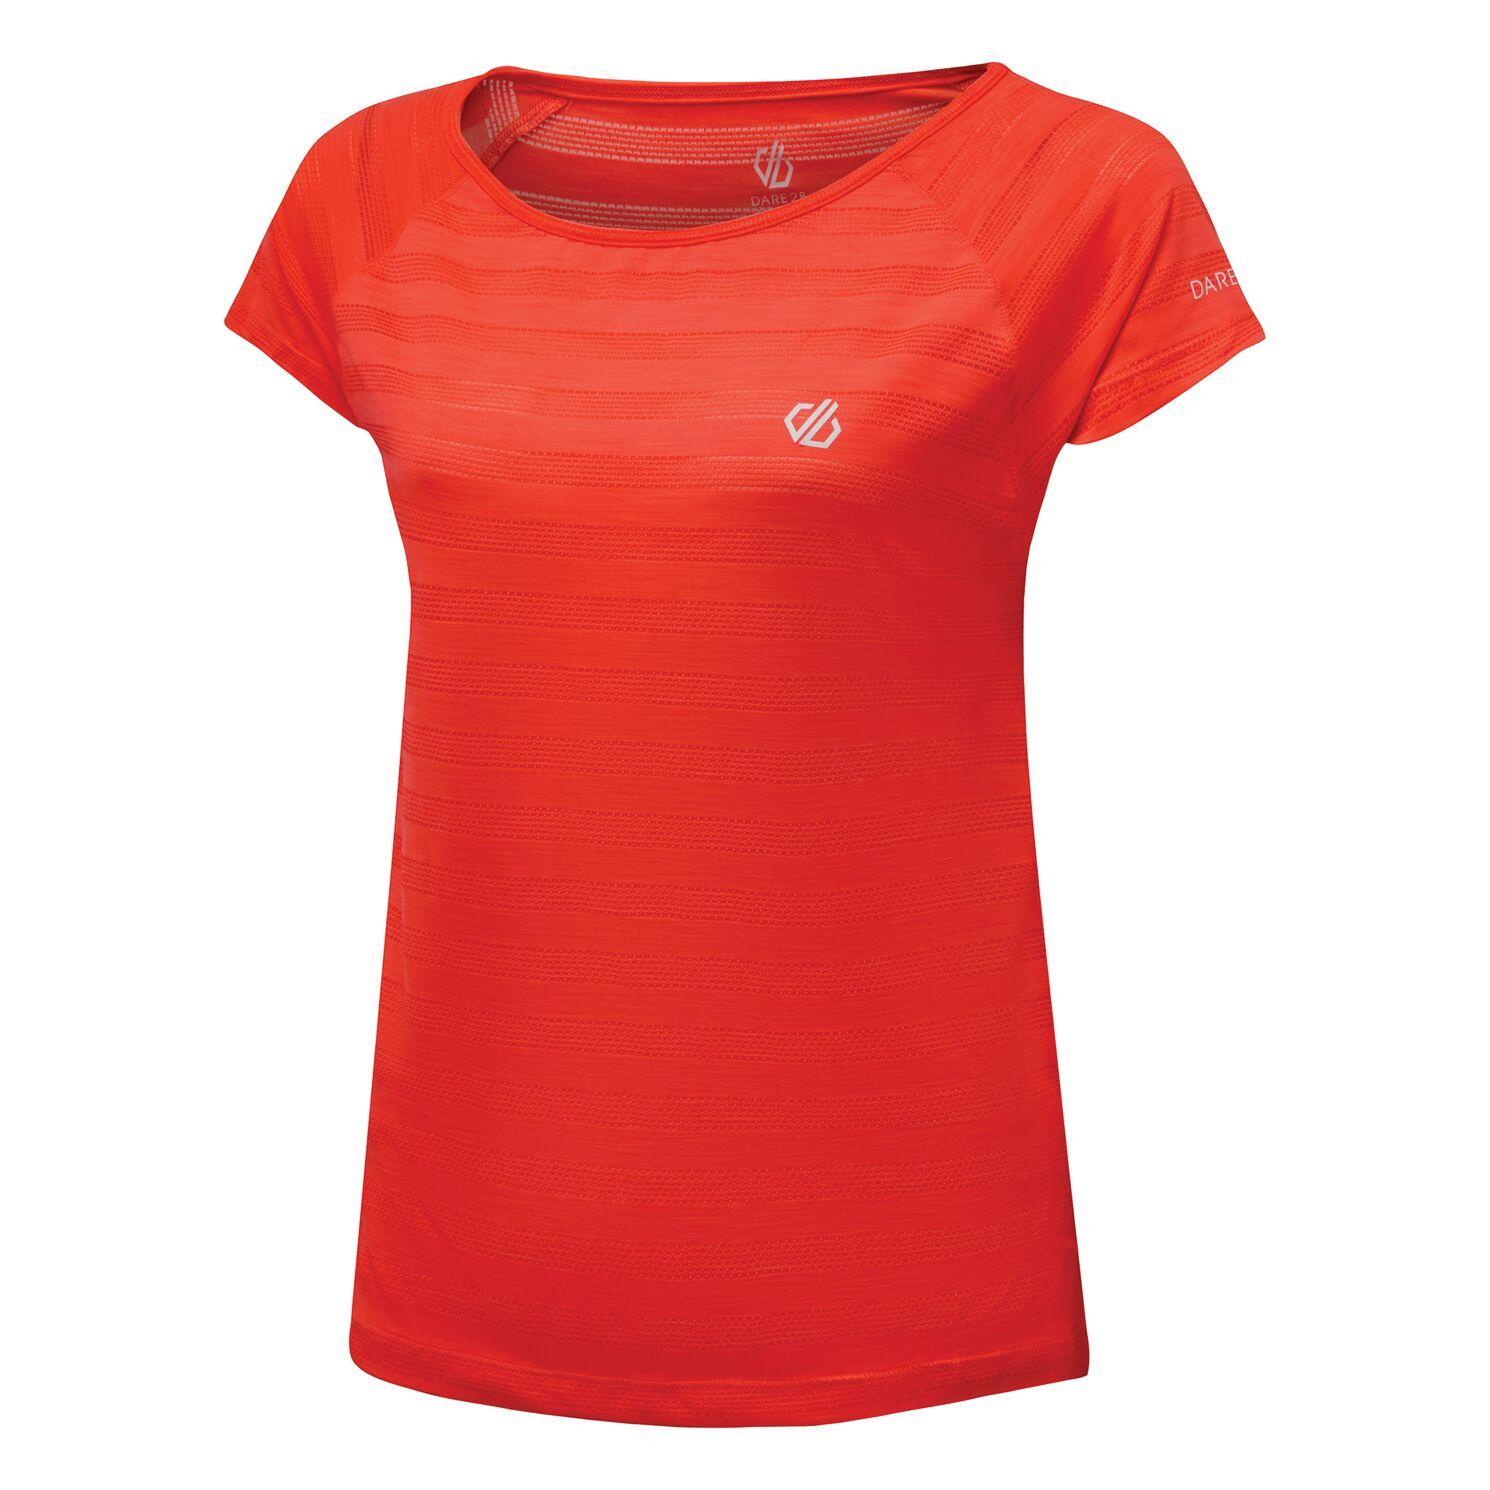 Dare 2B Womens/Ladies Defy T-Shirt